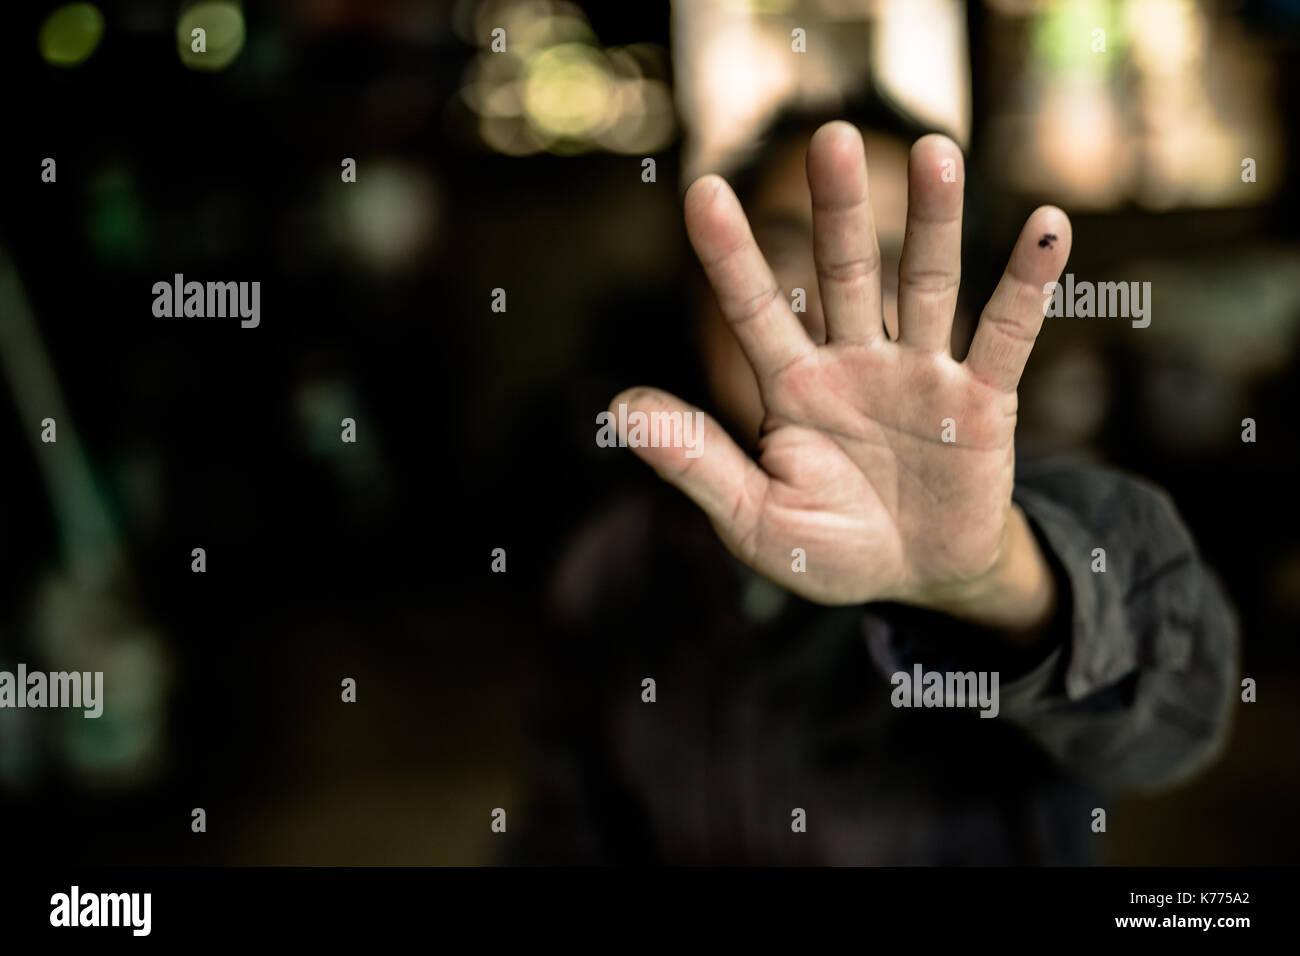 Stop missbrauchte junge Gewalt. Kind Bondage in Winkel Image Blur, Tag der Menschenrechte Konzept. Stockbild